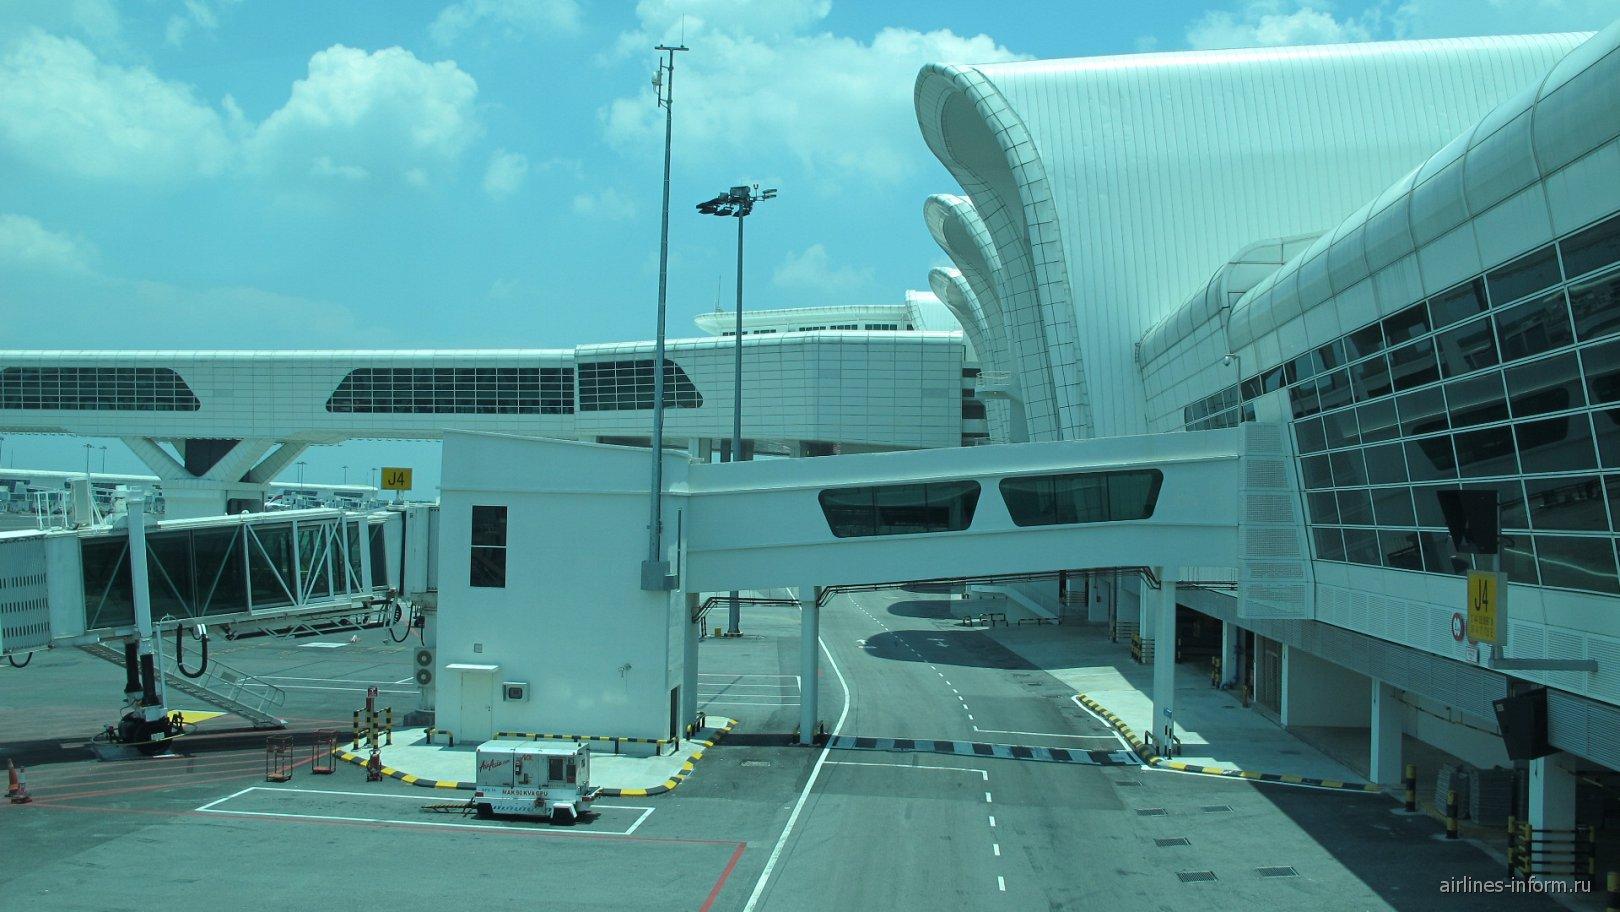 Лоукост-терминал KLIA2 аэропорта Куала-Лумпур